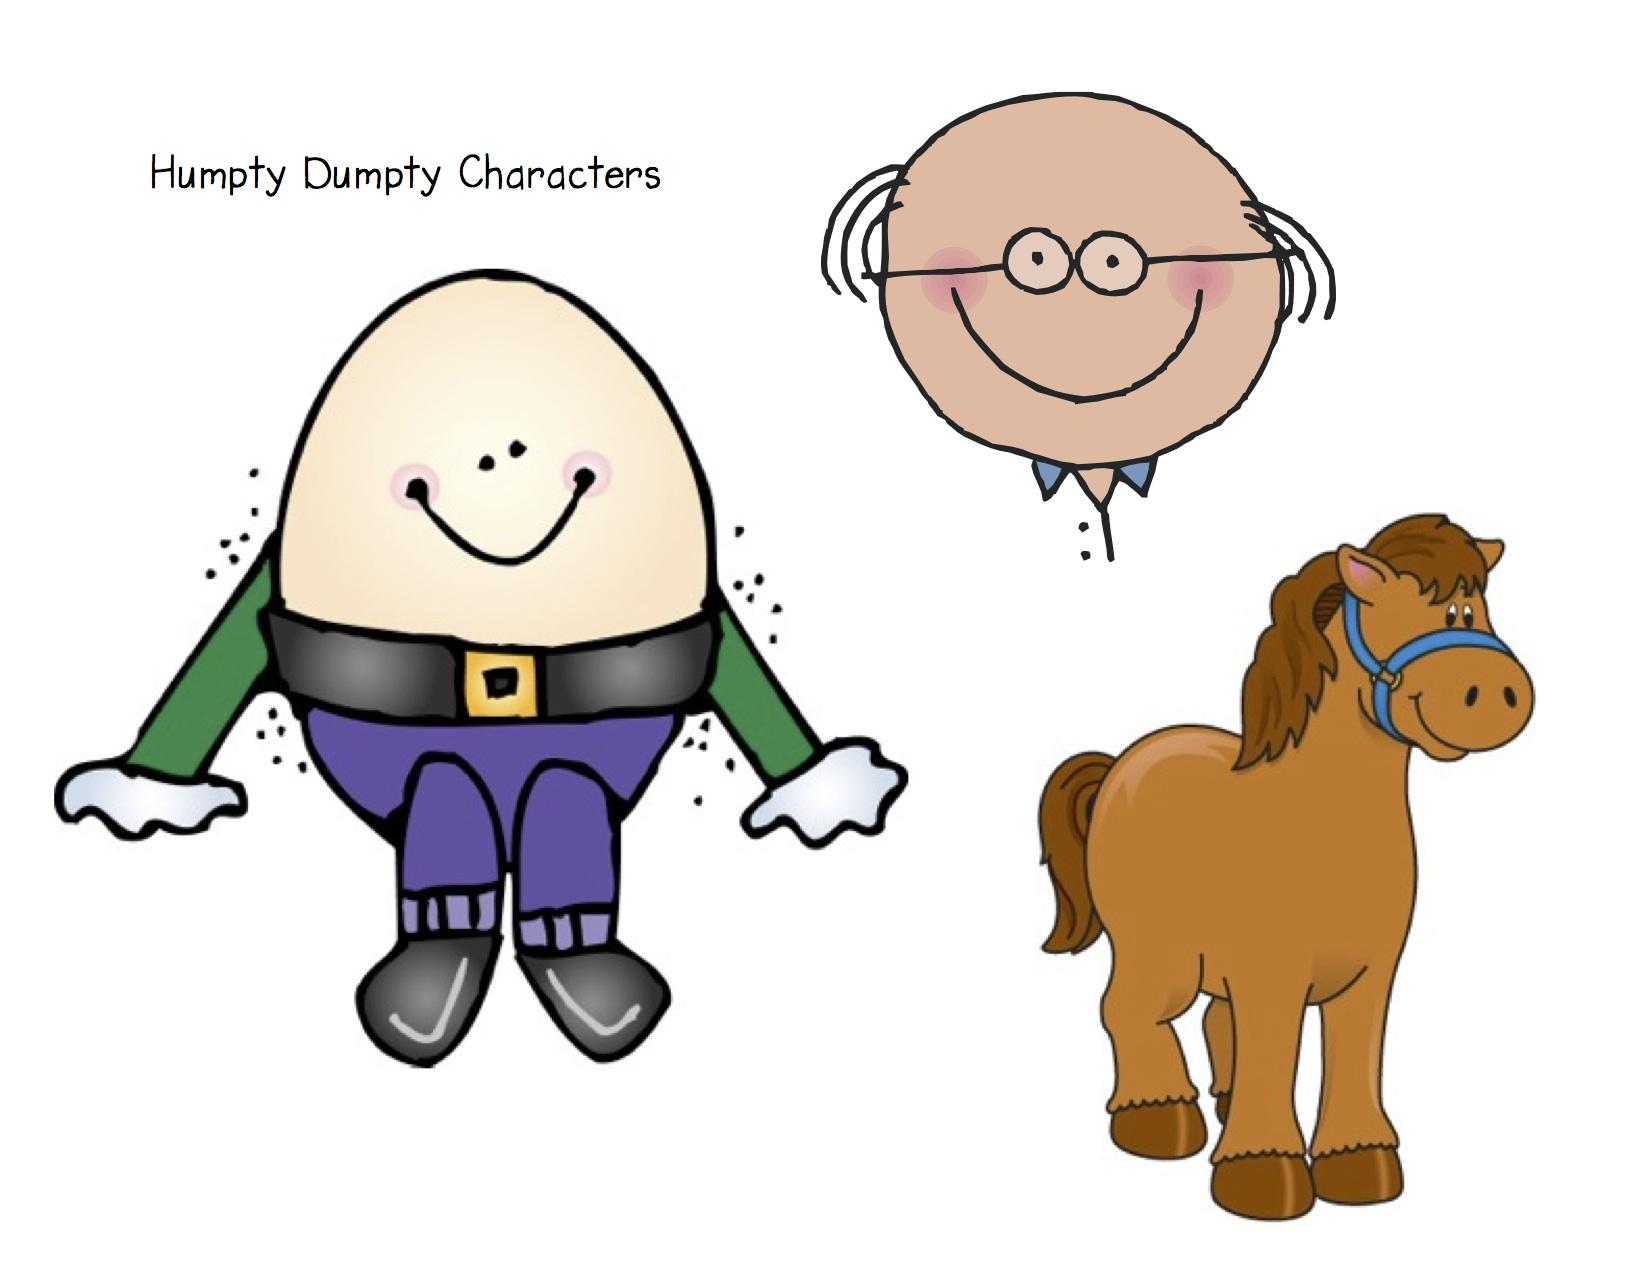 Humpty Dumpty Clip Art More fun with nursery rhymes! kindergarten nana